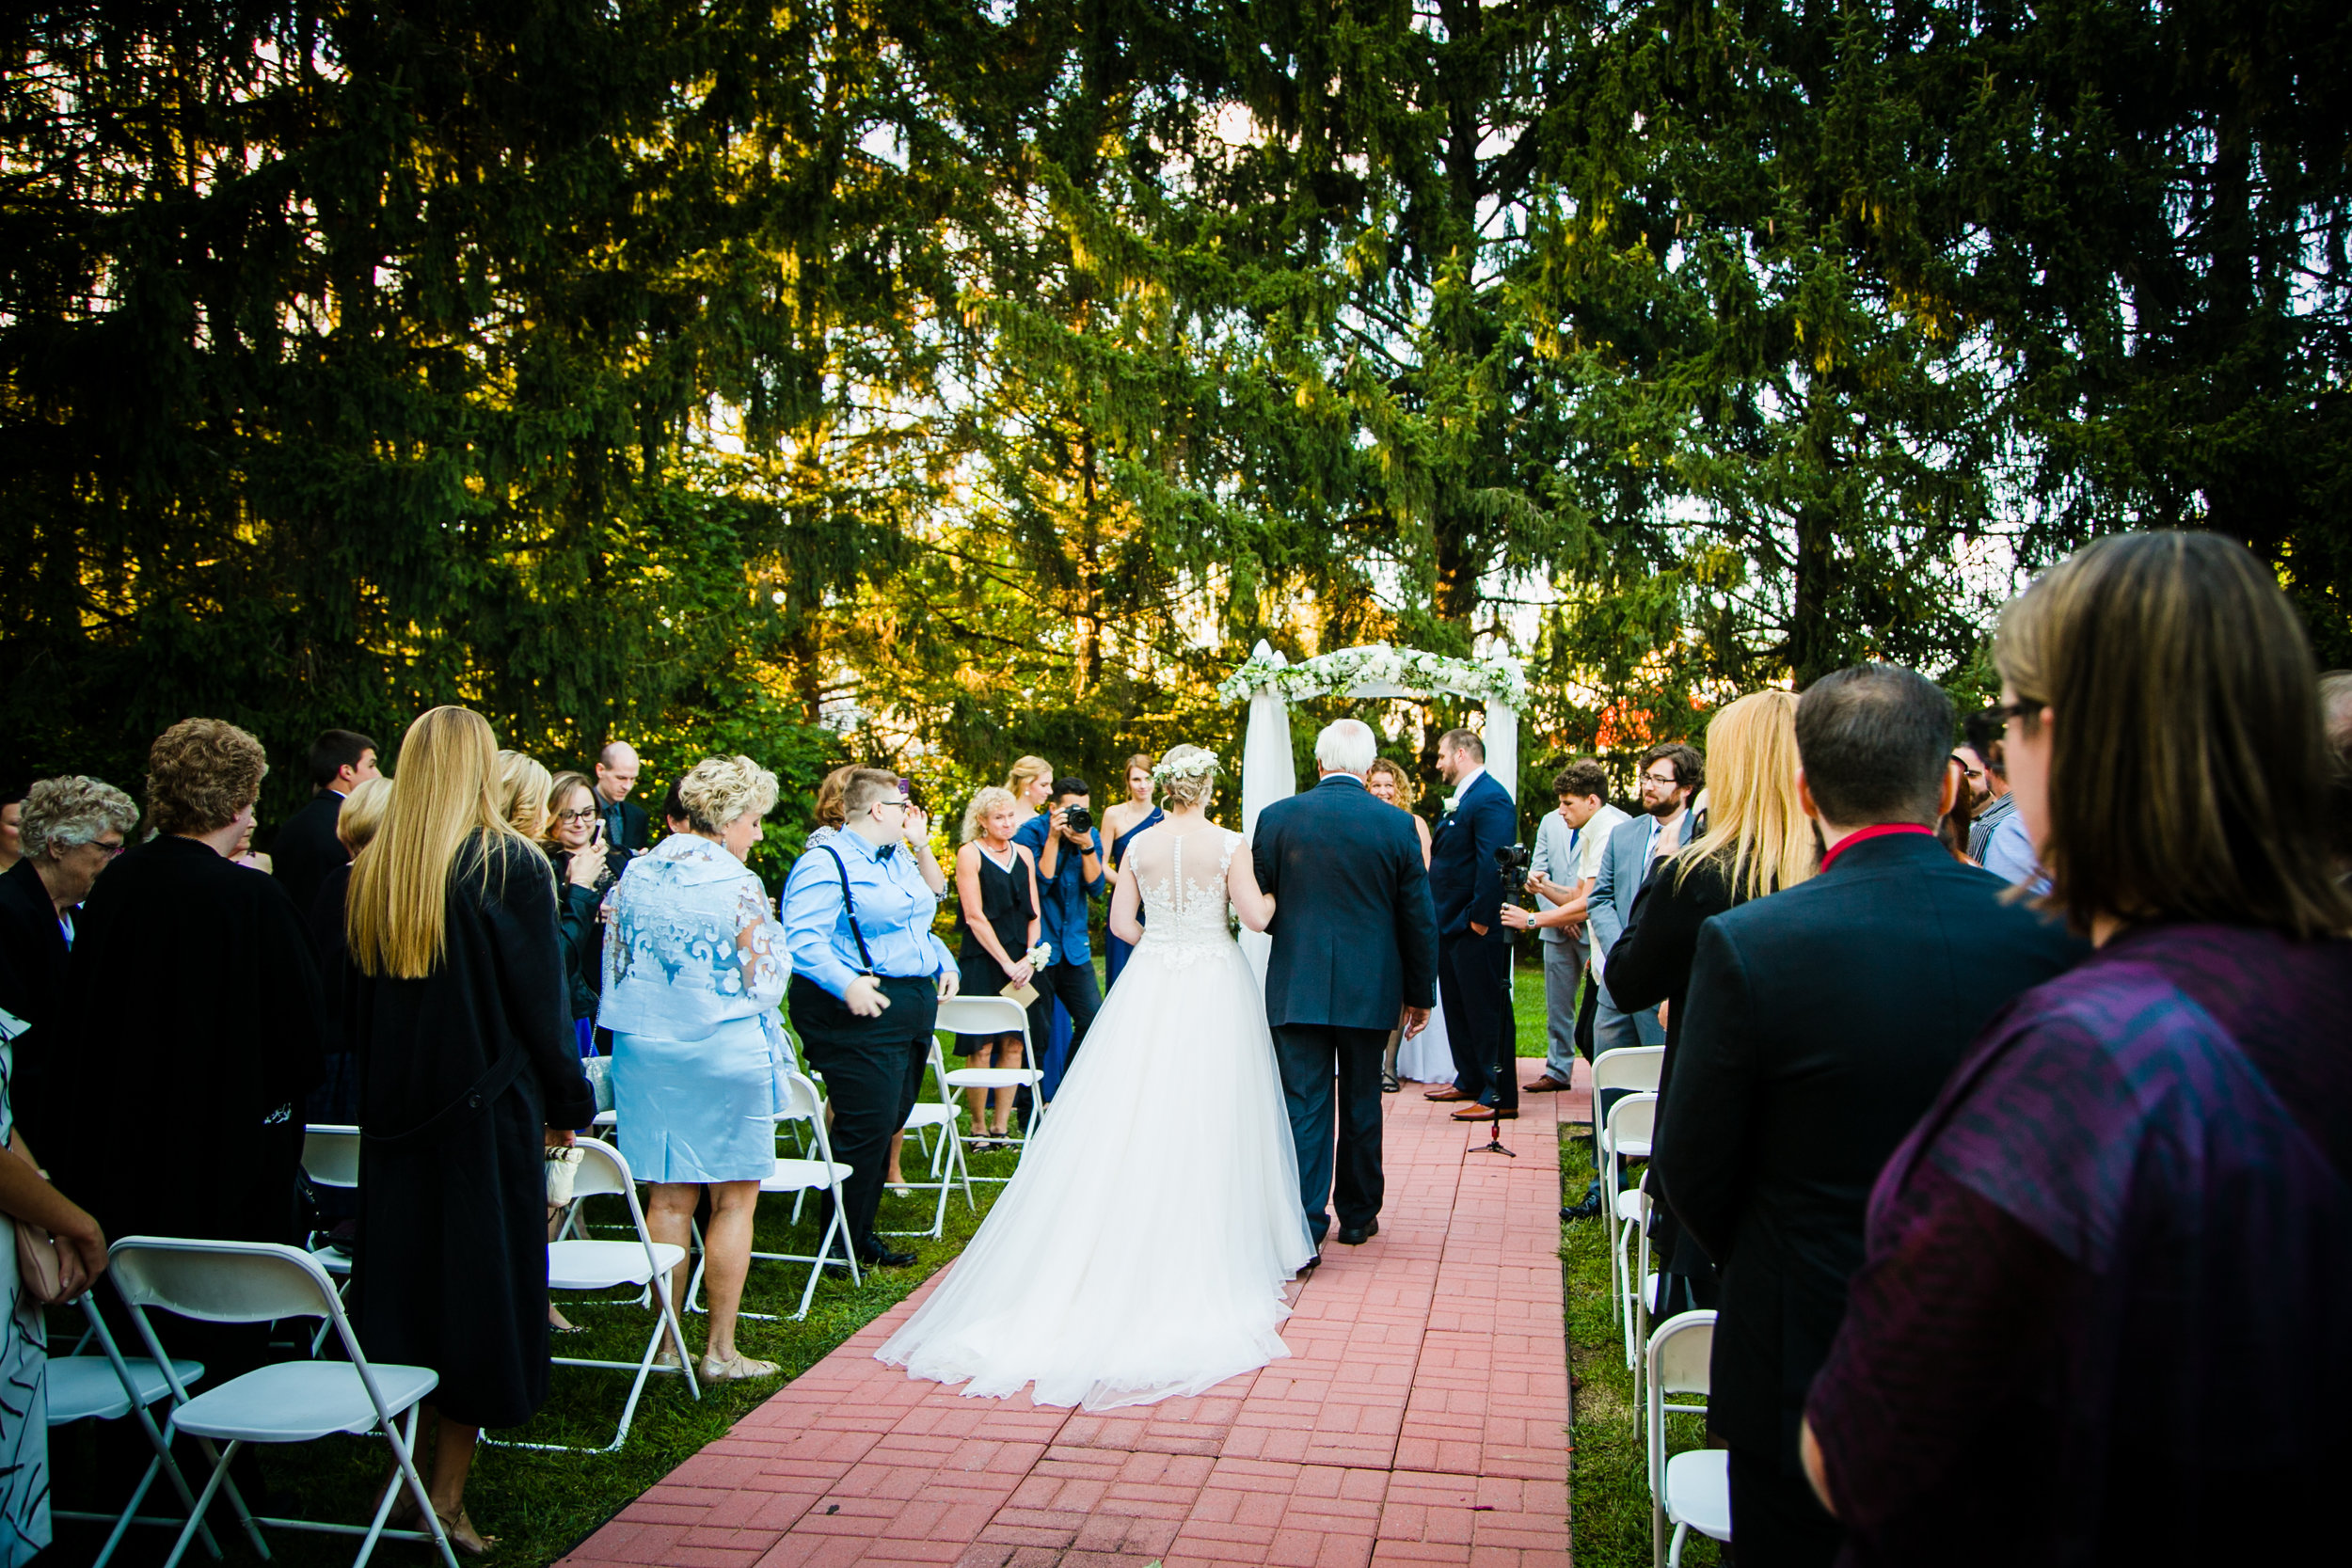 LA LUNA BANQUET HALL WEDDING BENSALEM - 046.jpg